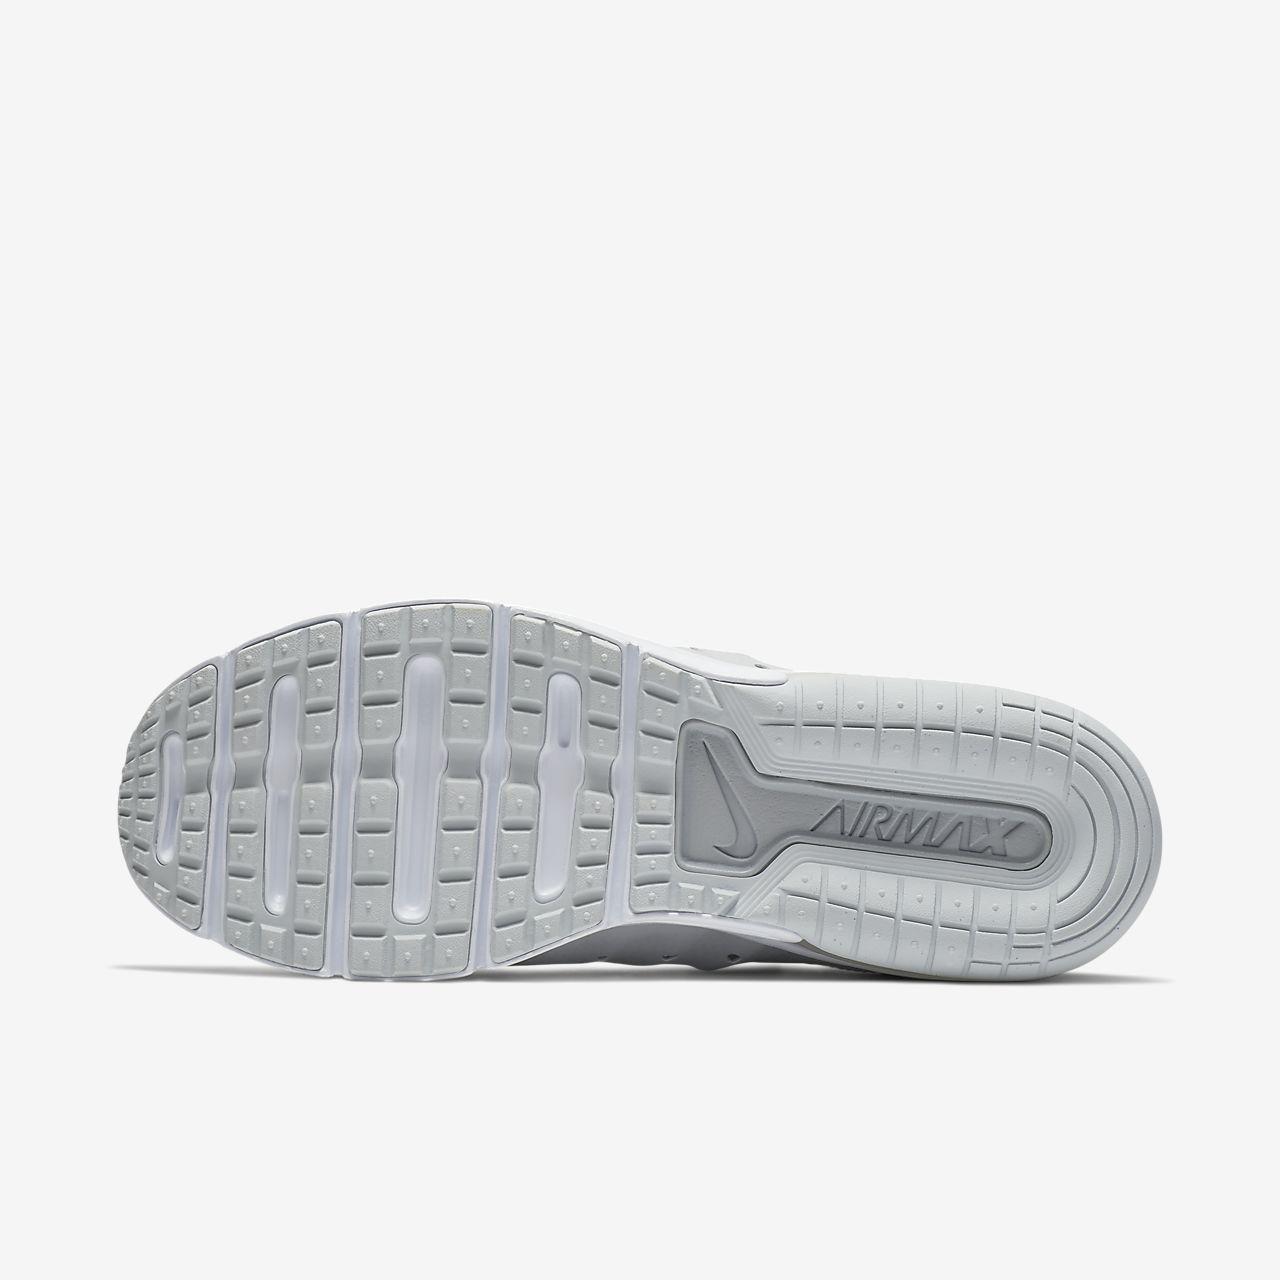 reputable site e7555 a6a2b ... Nike Air Max Sequent 3 Kadın Ayakkabısı